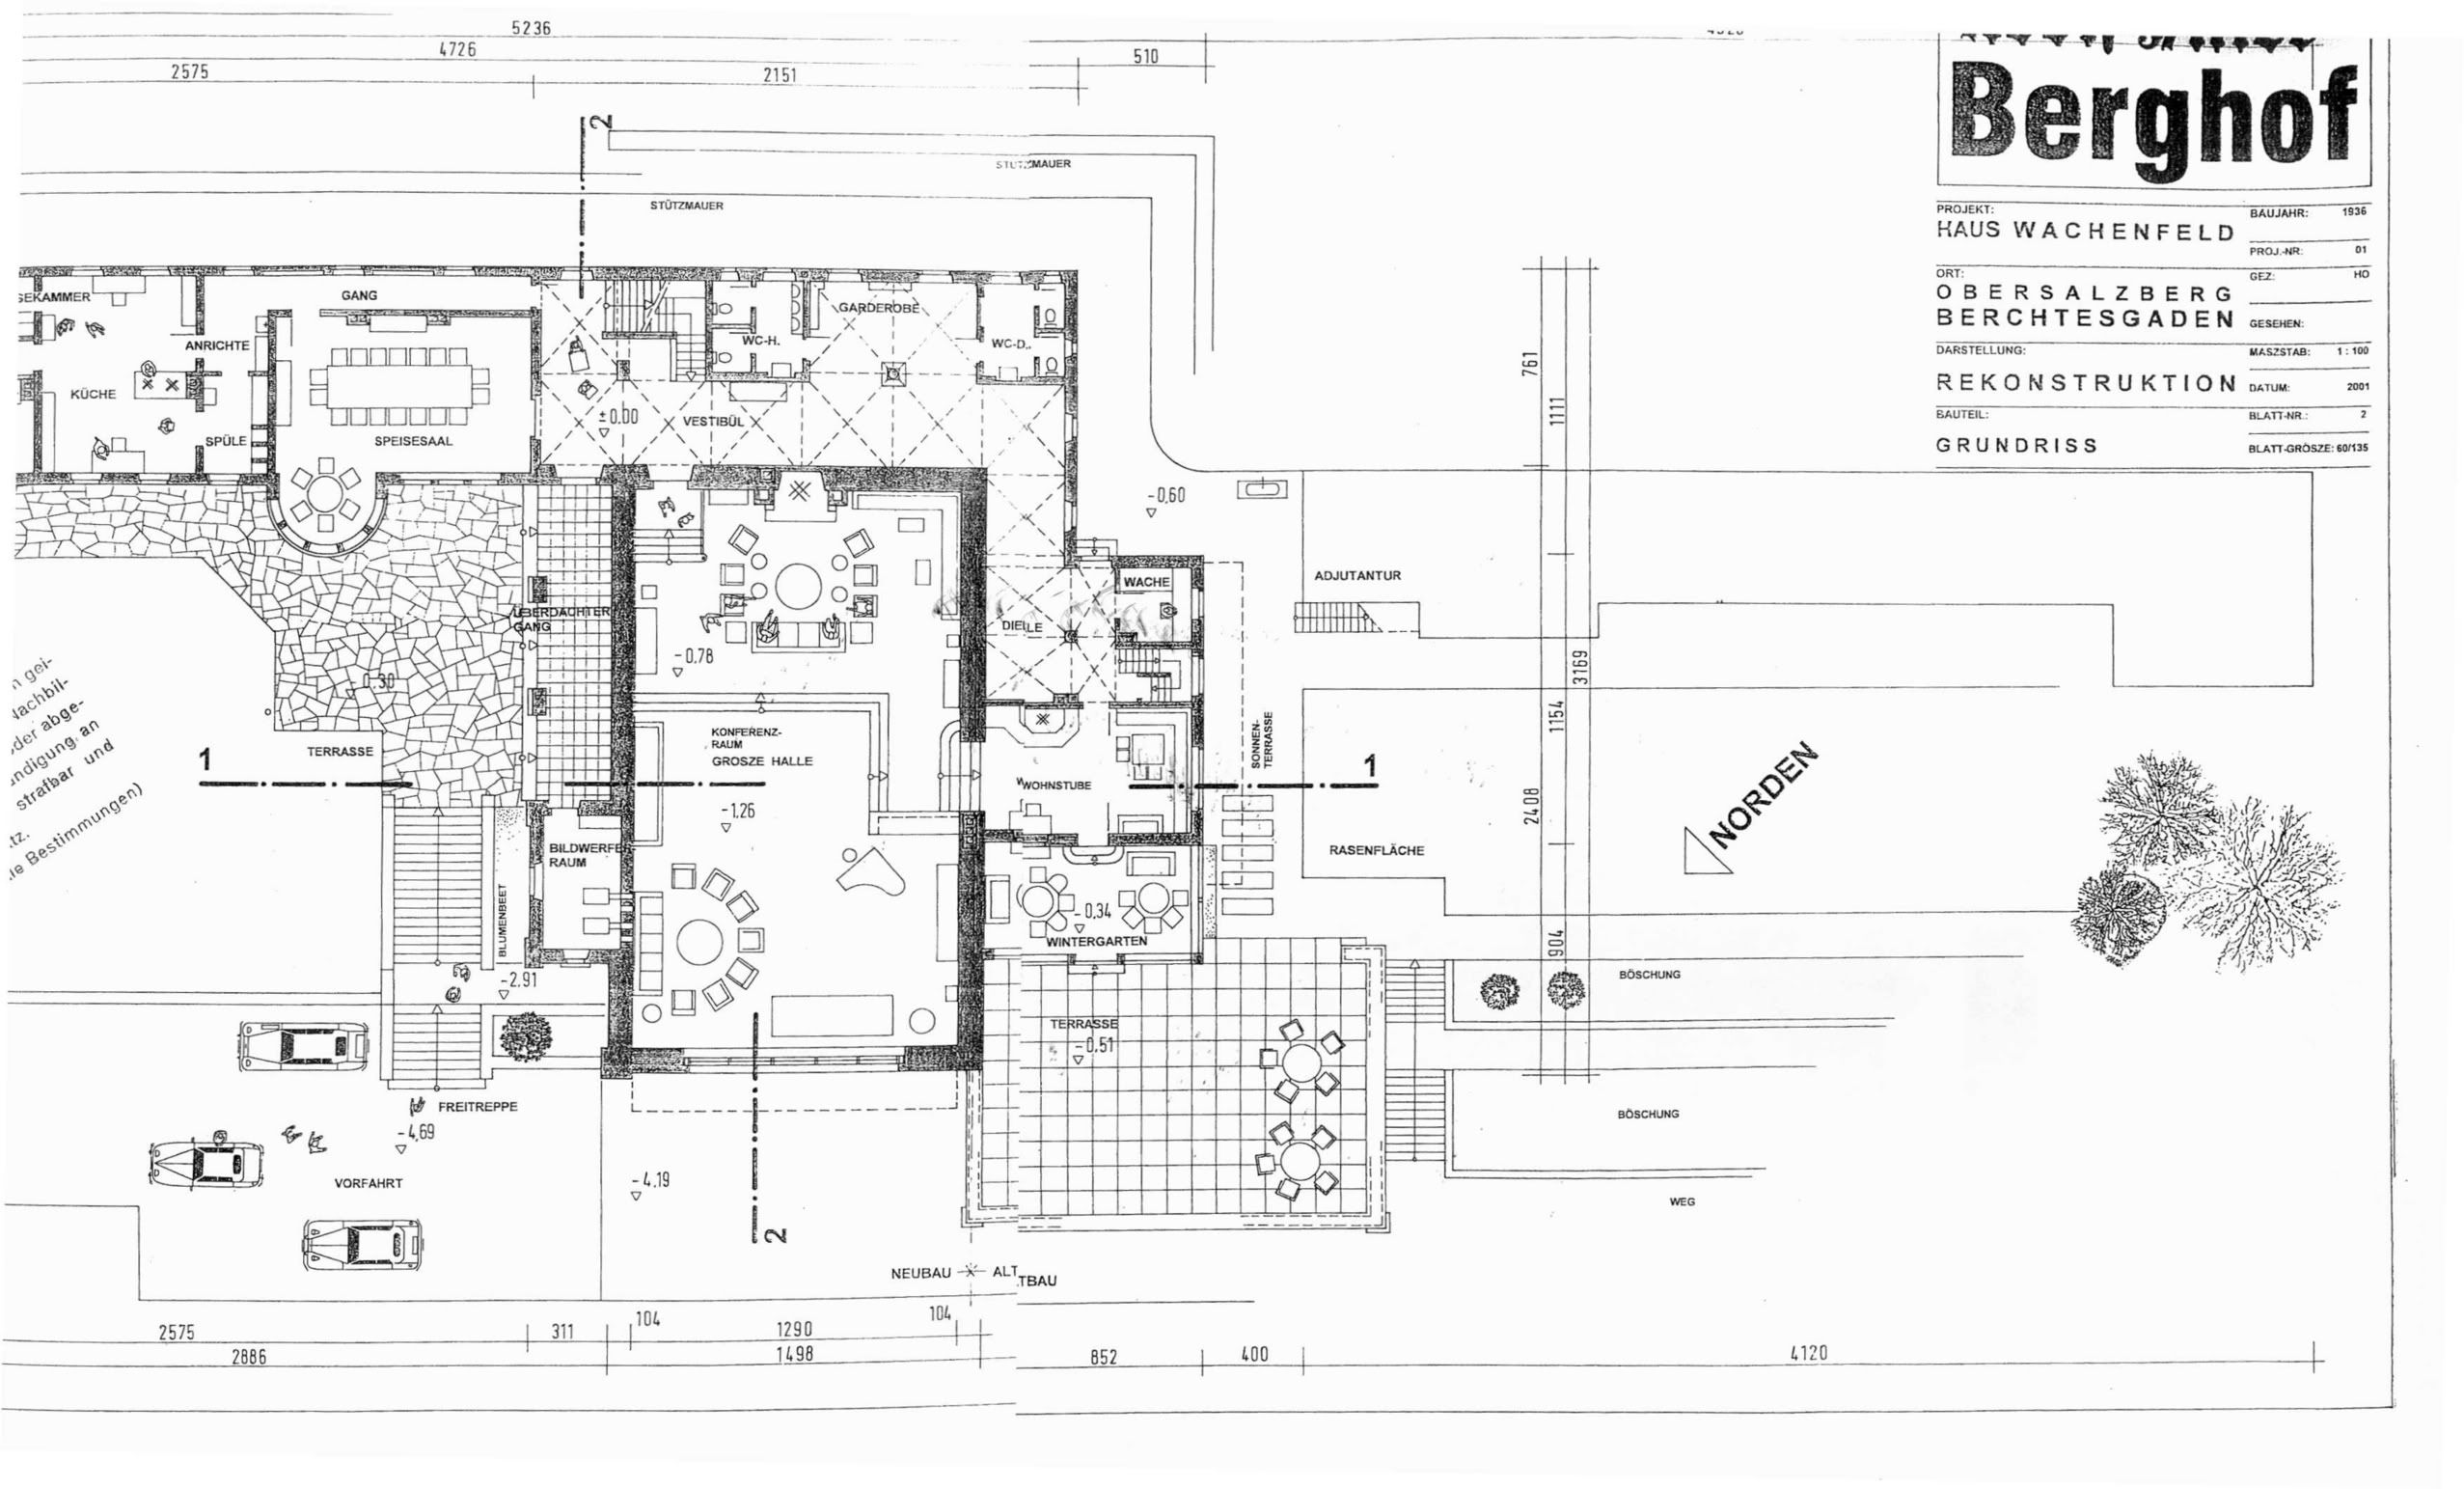 Plan Detaille Du Berghof